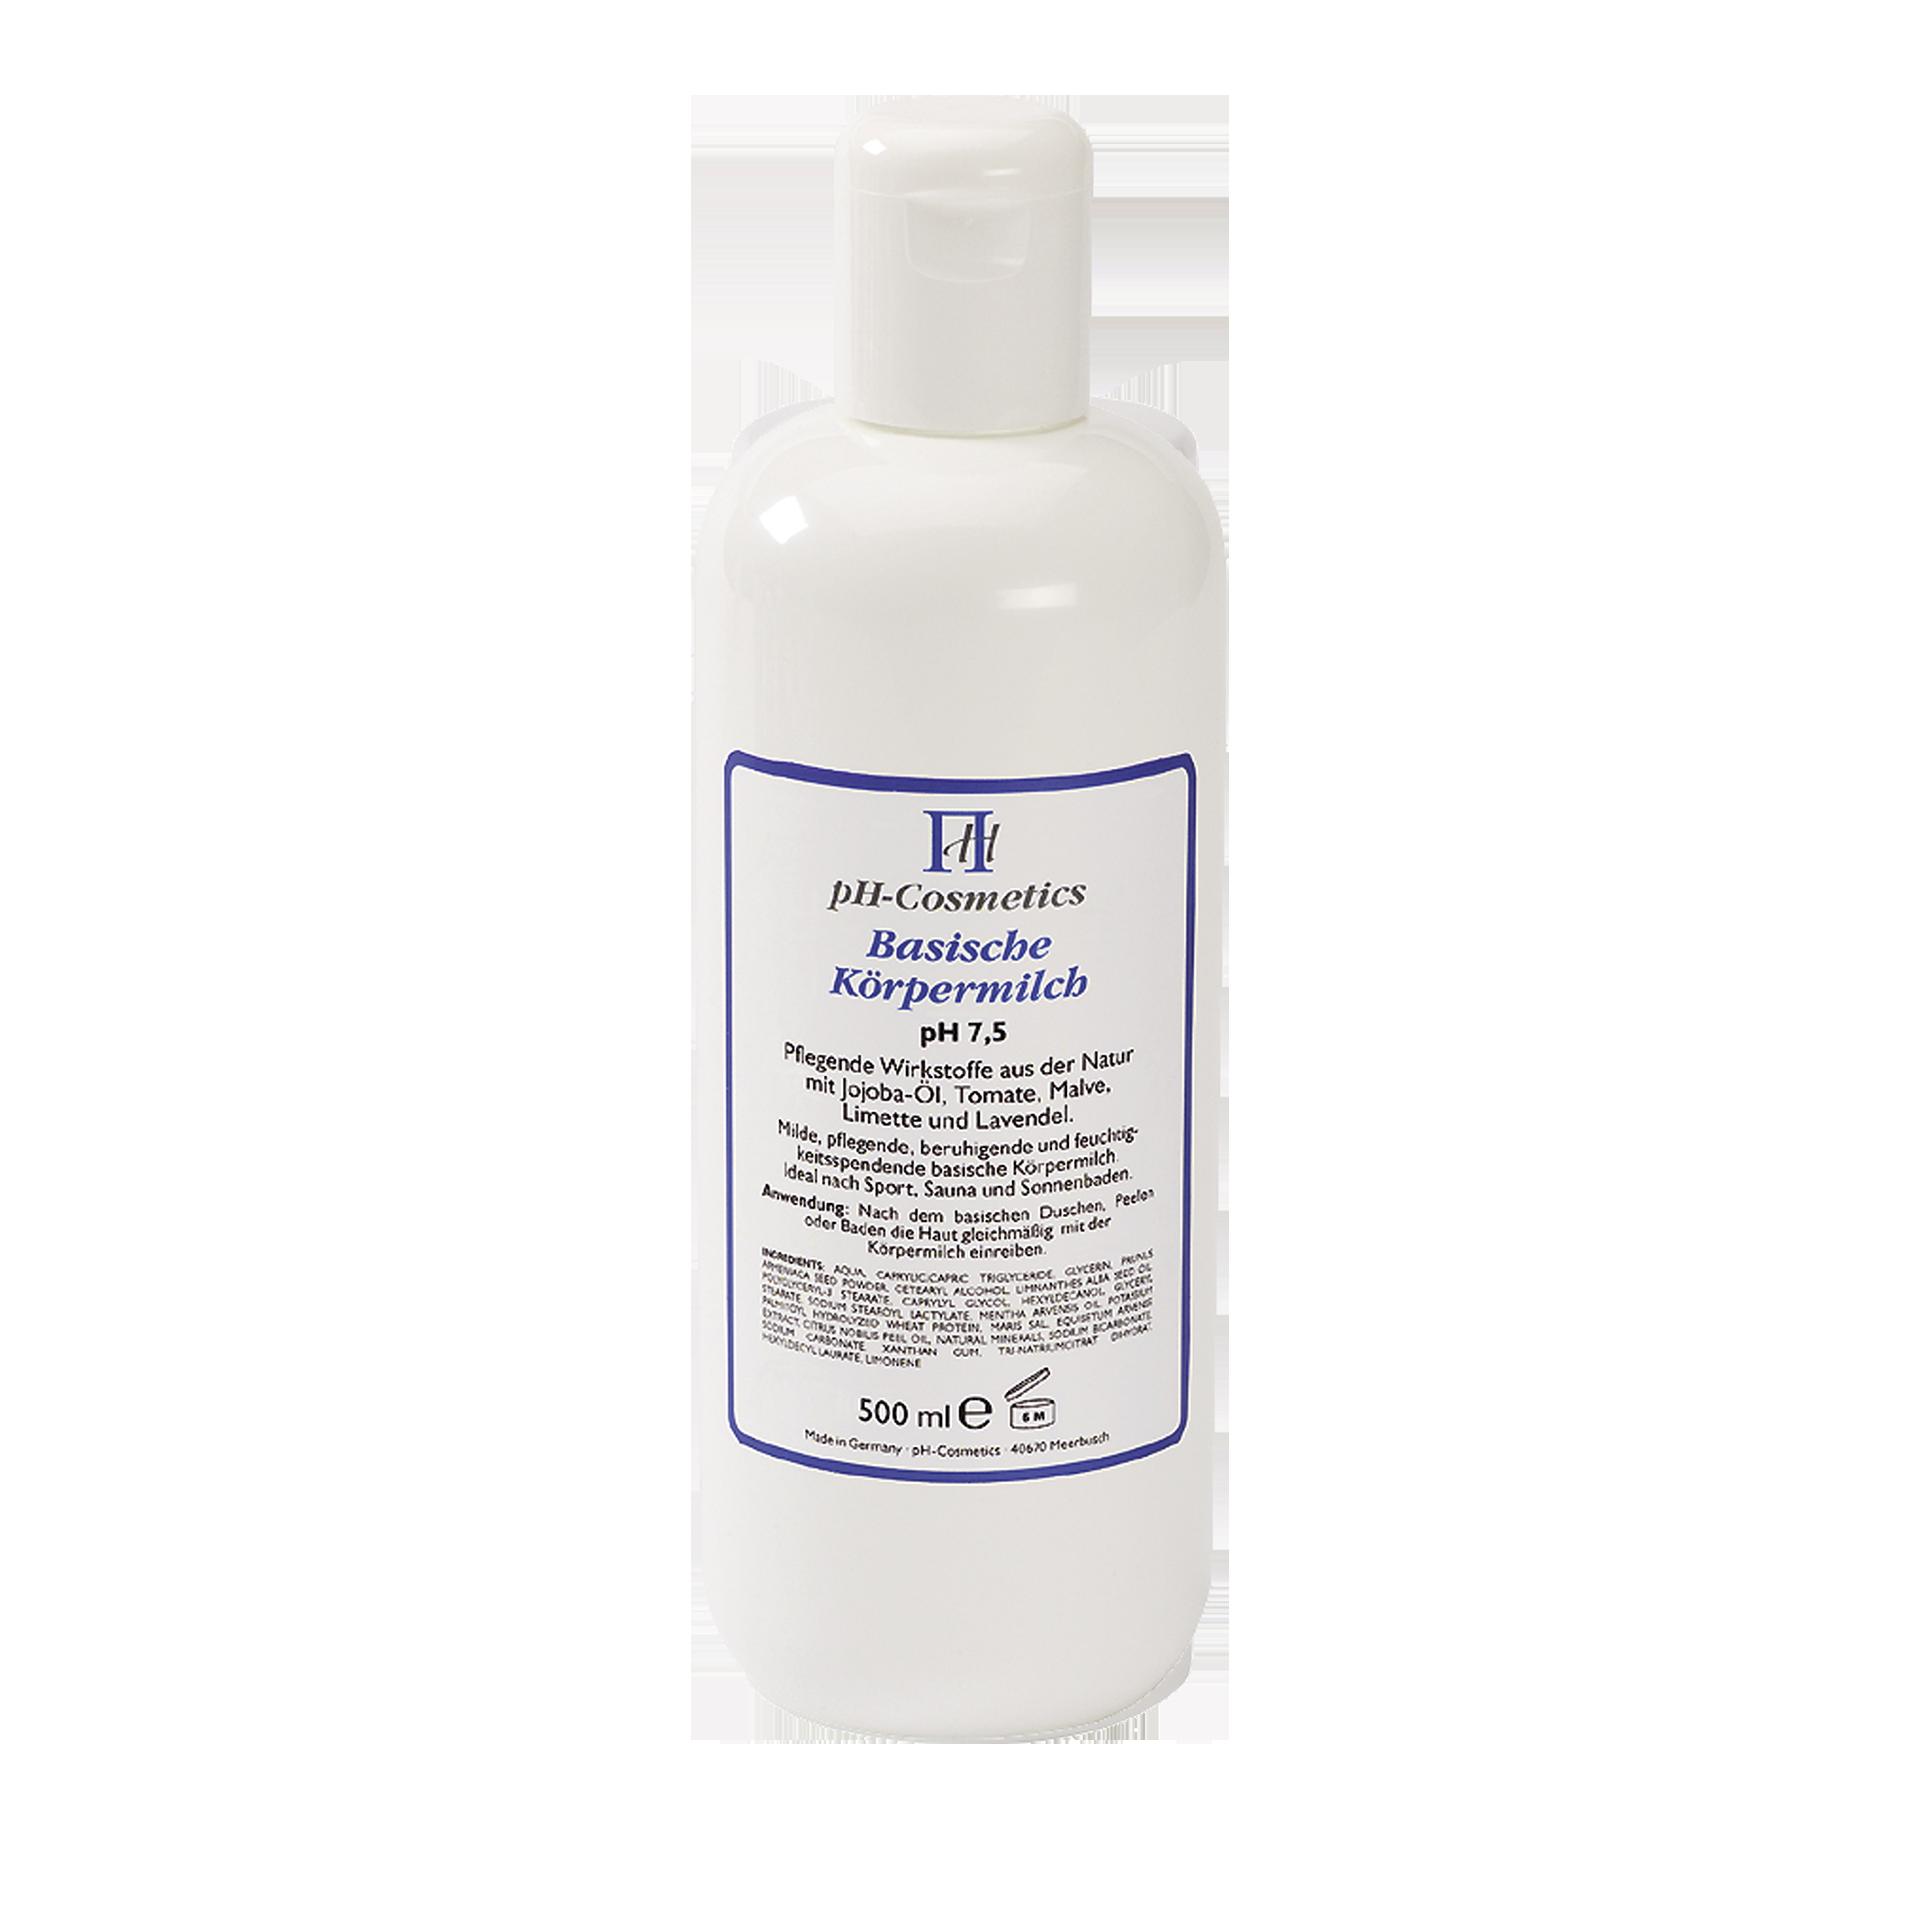 pH-Cosmetics Basische Körpermilch, pH 7.5, 500 ml